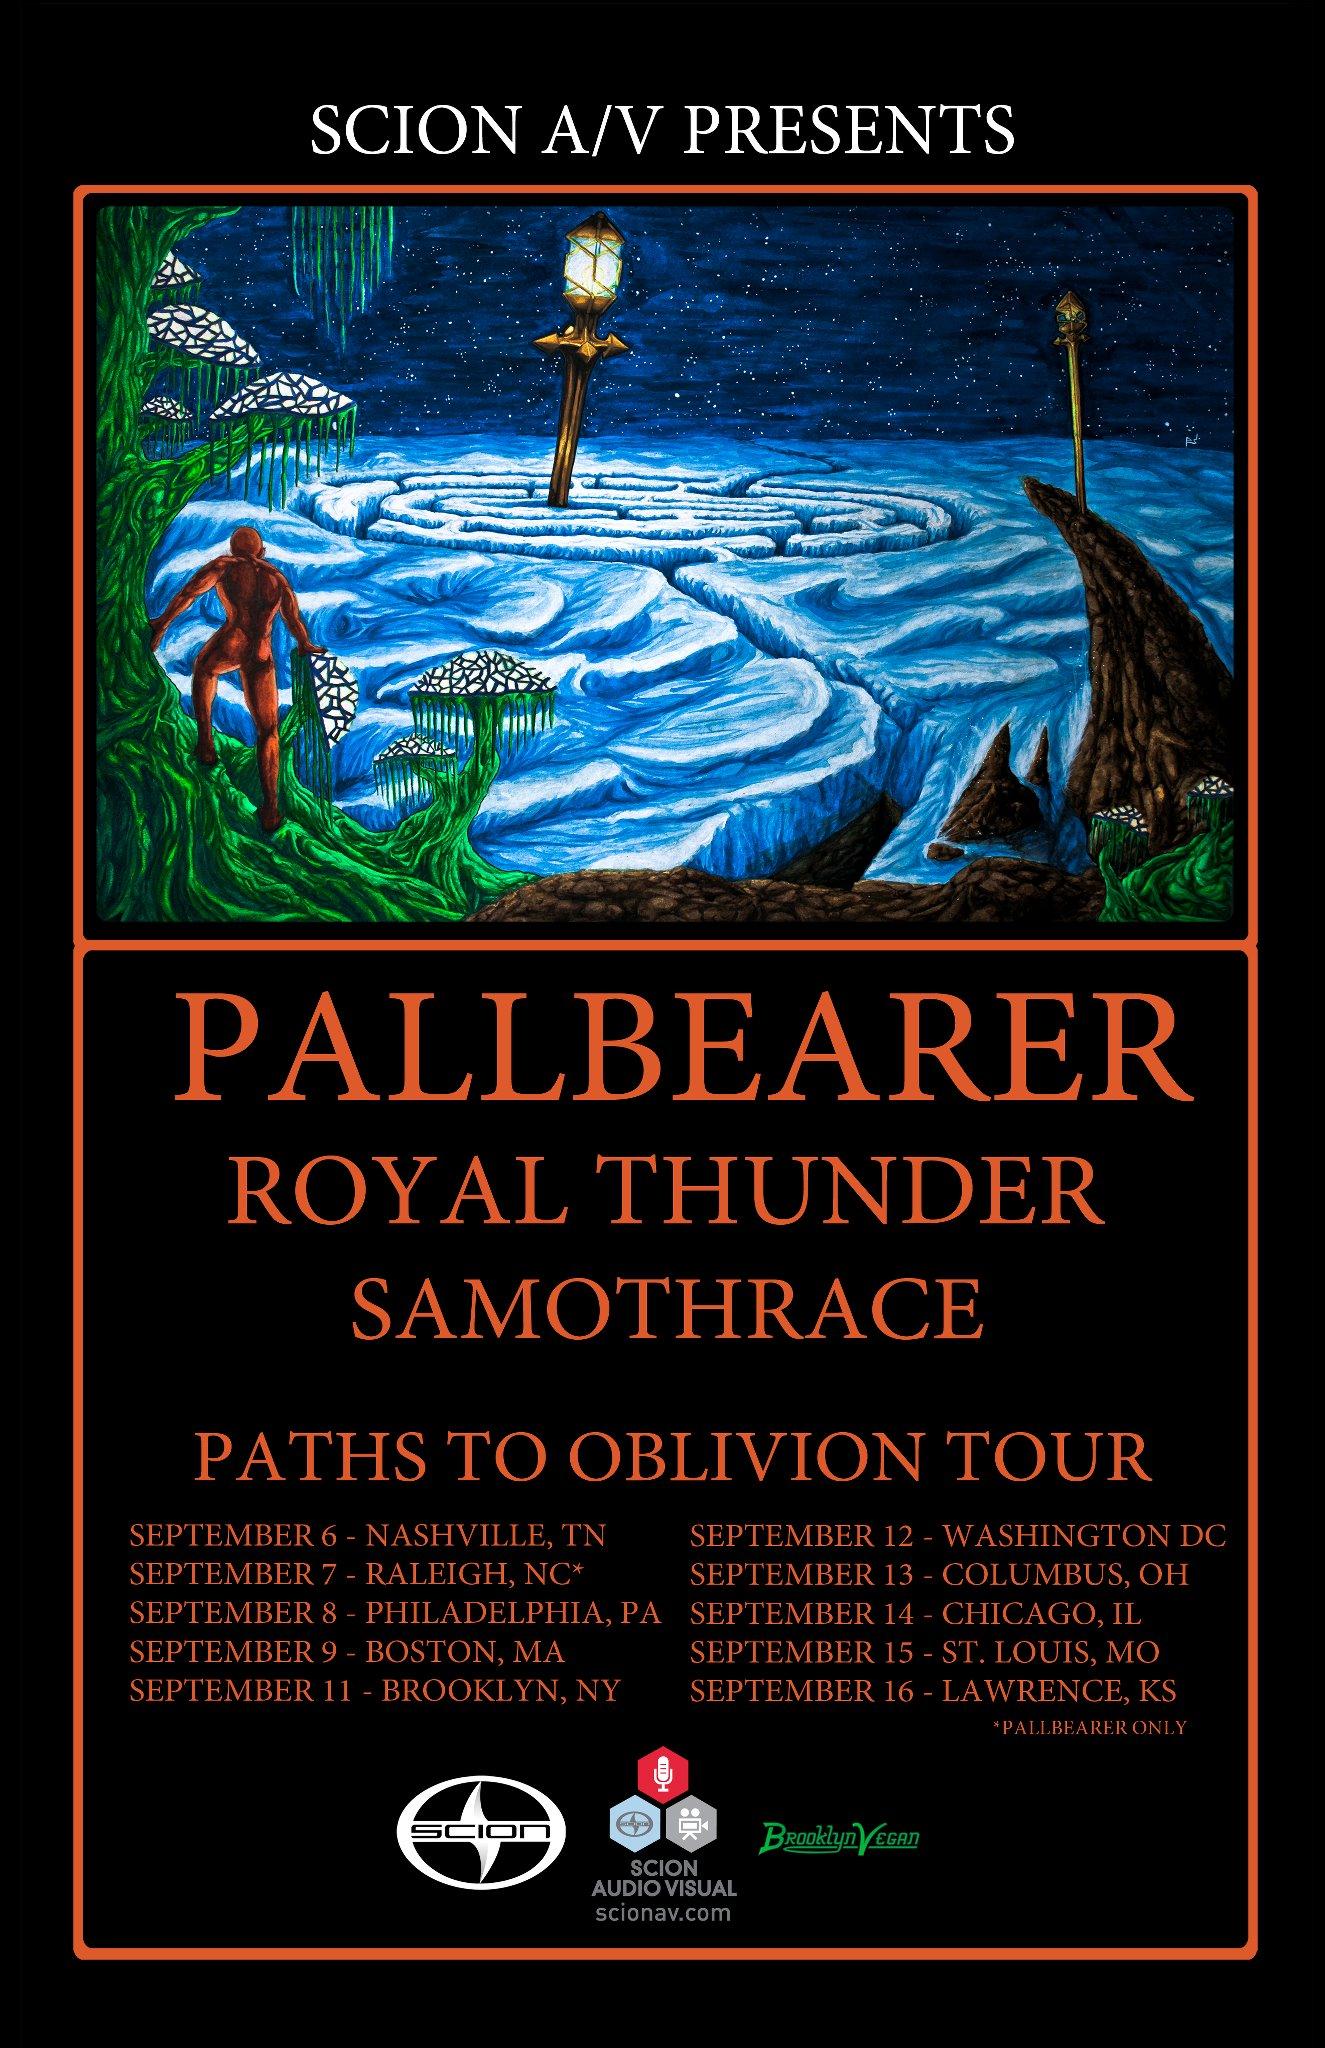 Pallbearer Tour Poster